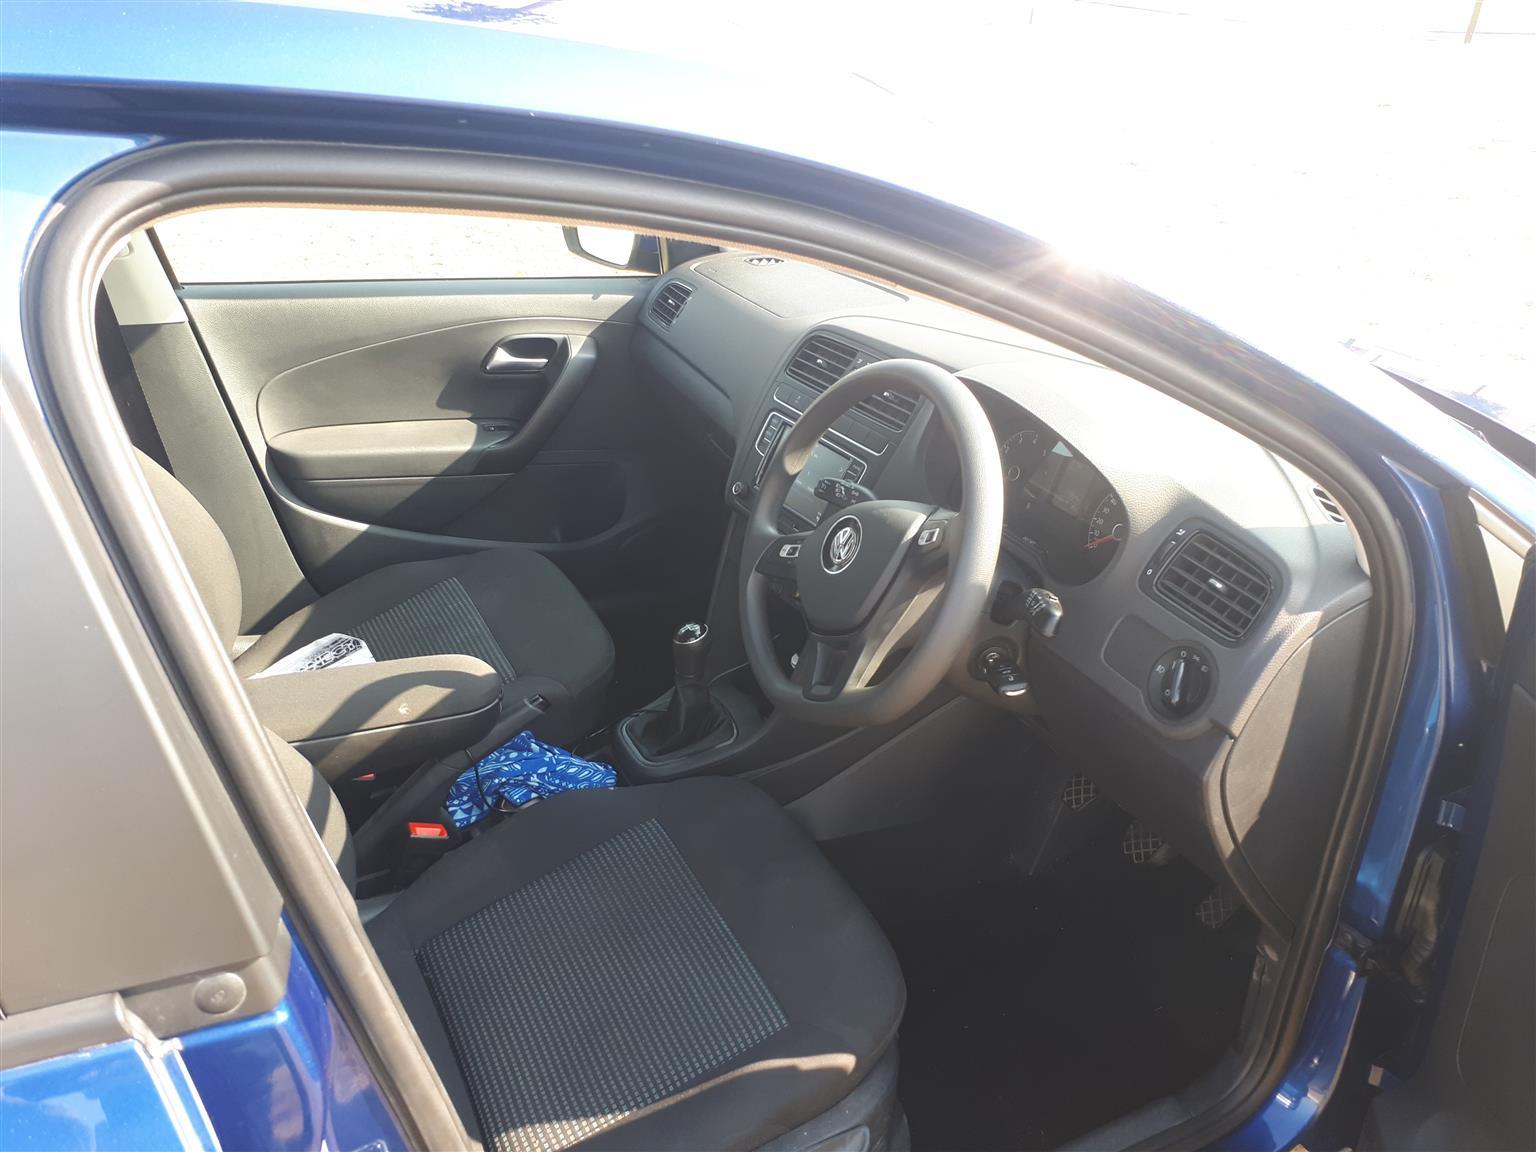 2019 VW Polo Vivo hatch 1.4 Conceptline